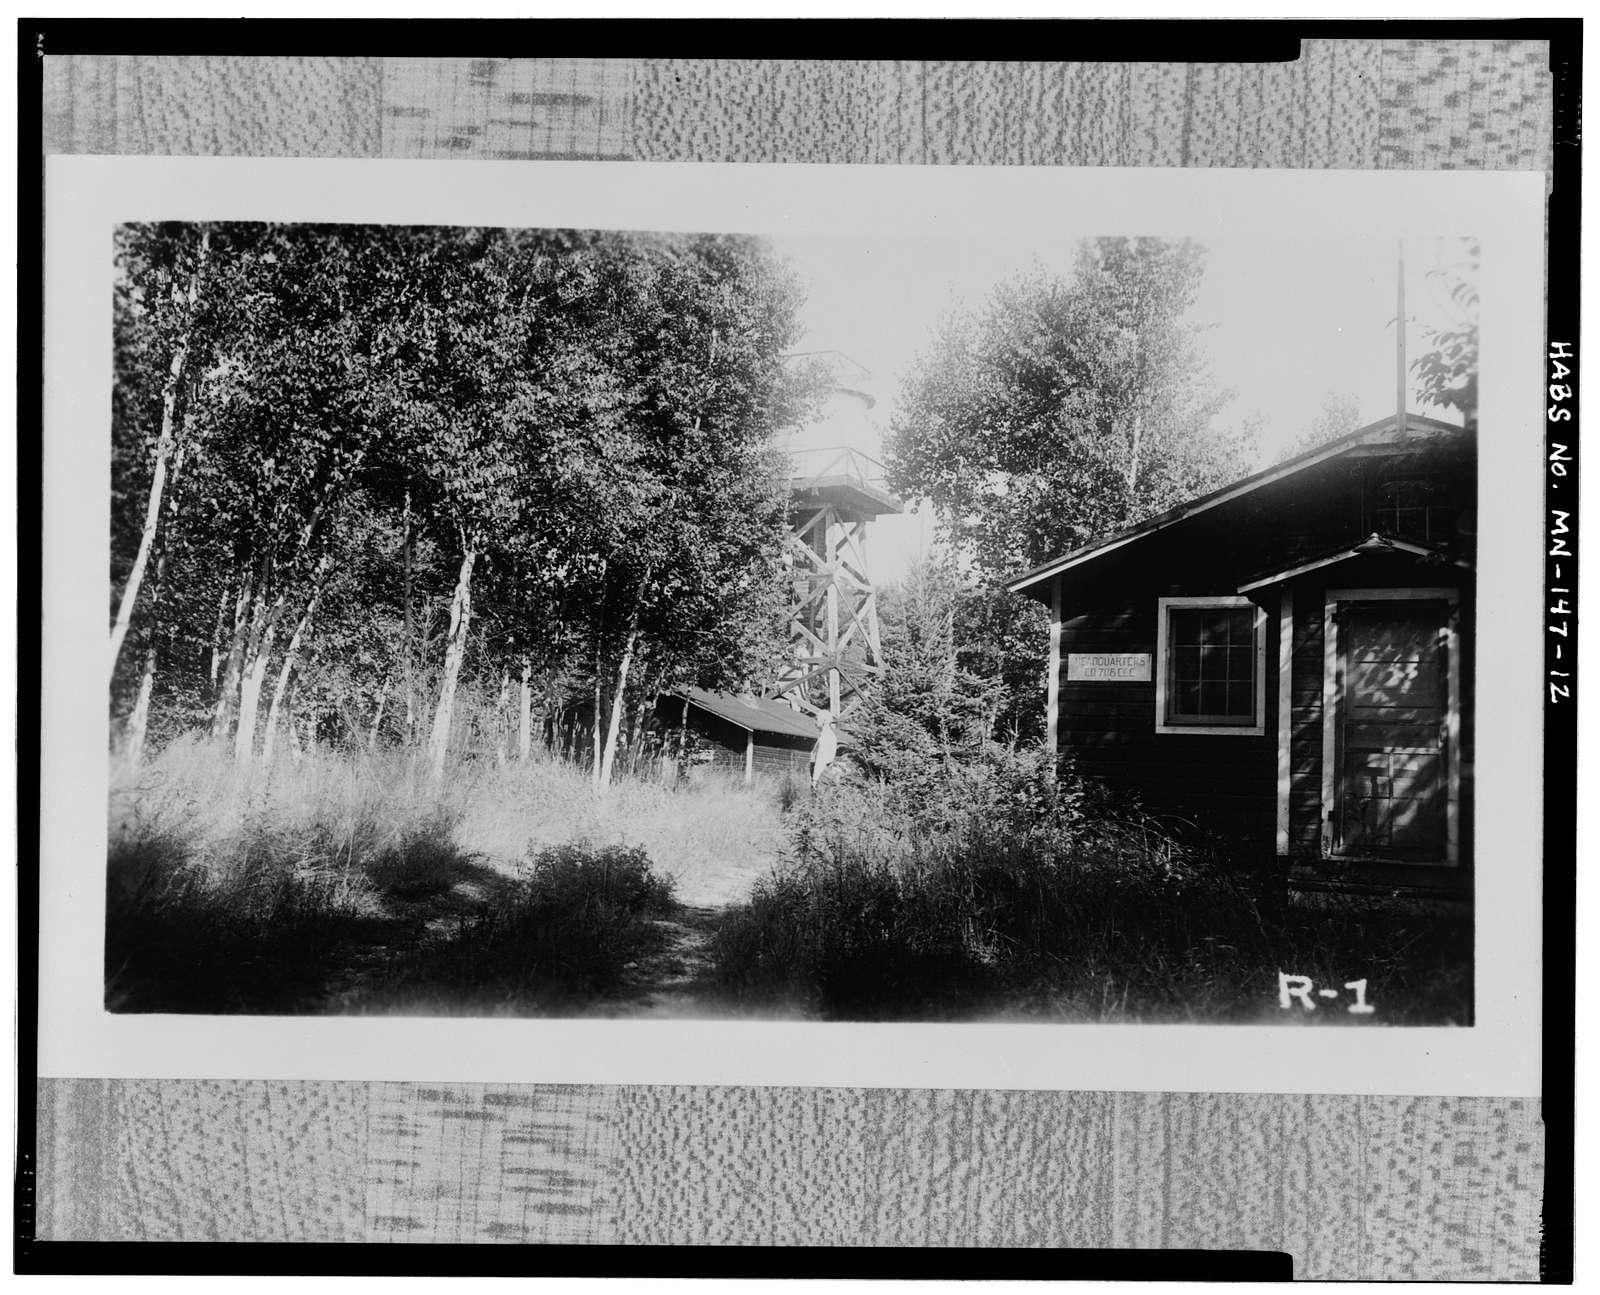 Rabideau Civilian Conservation Corps Camp, County Road 39, Blackduck, Beltrami County, MN